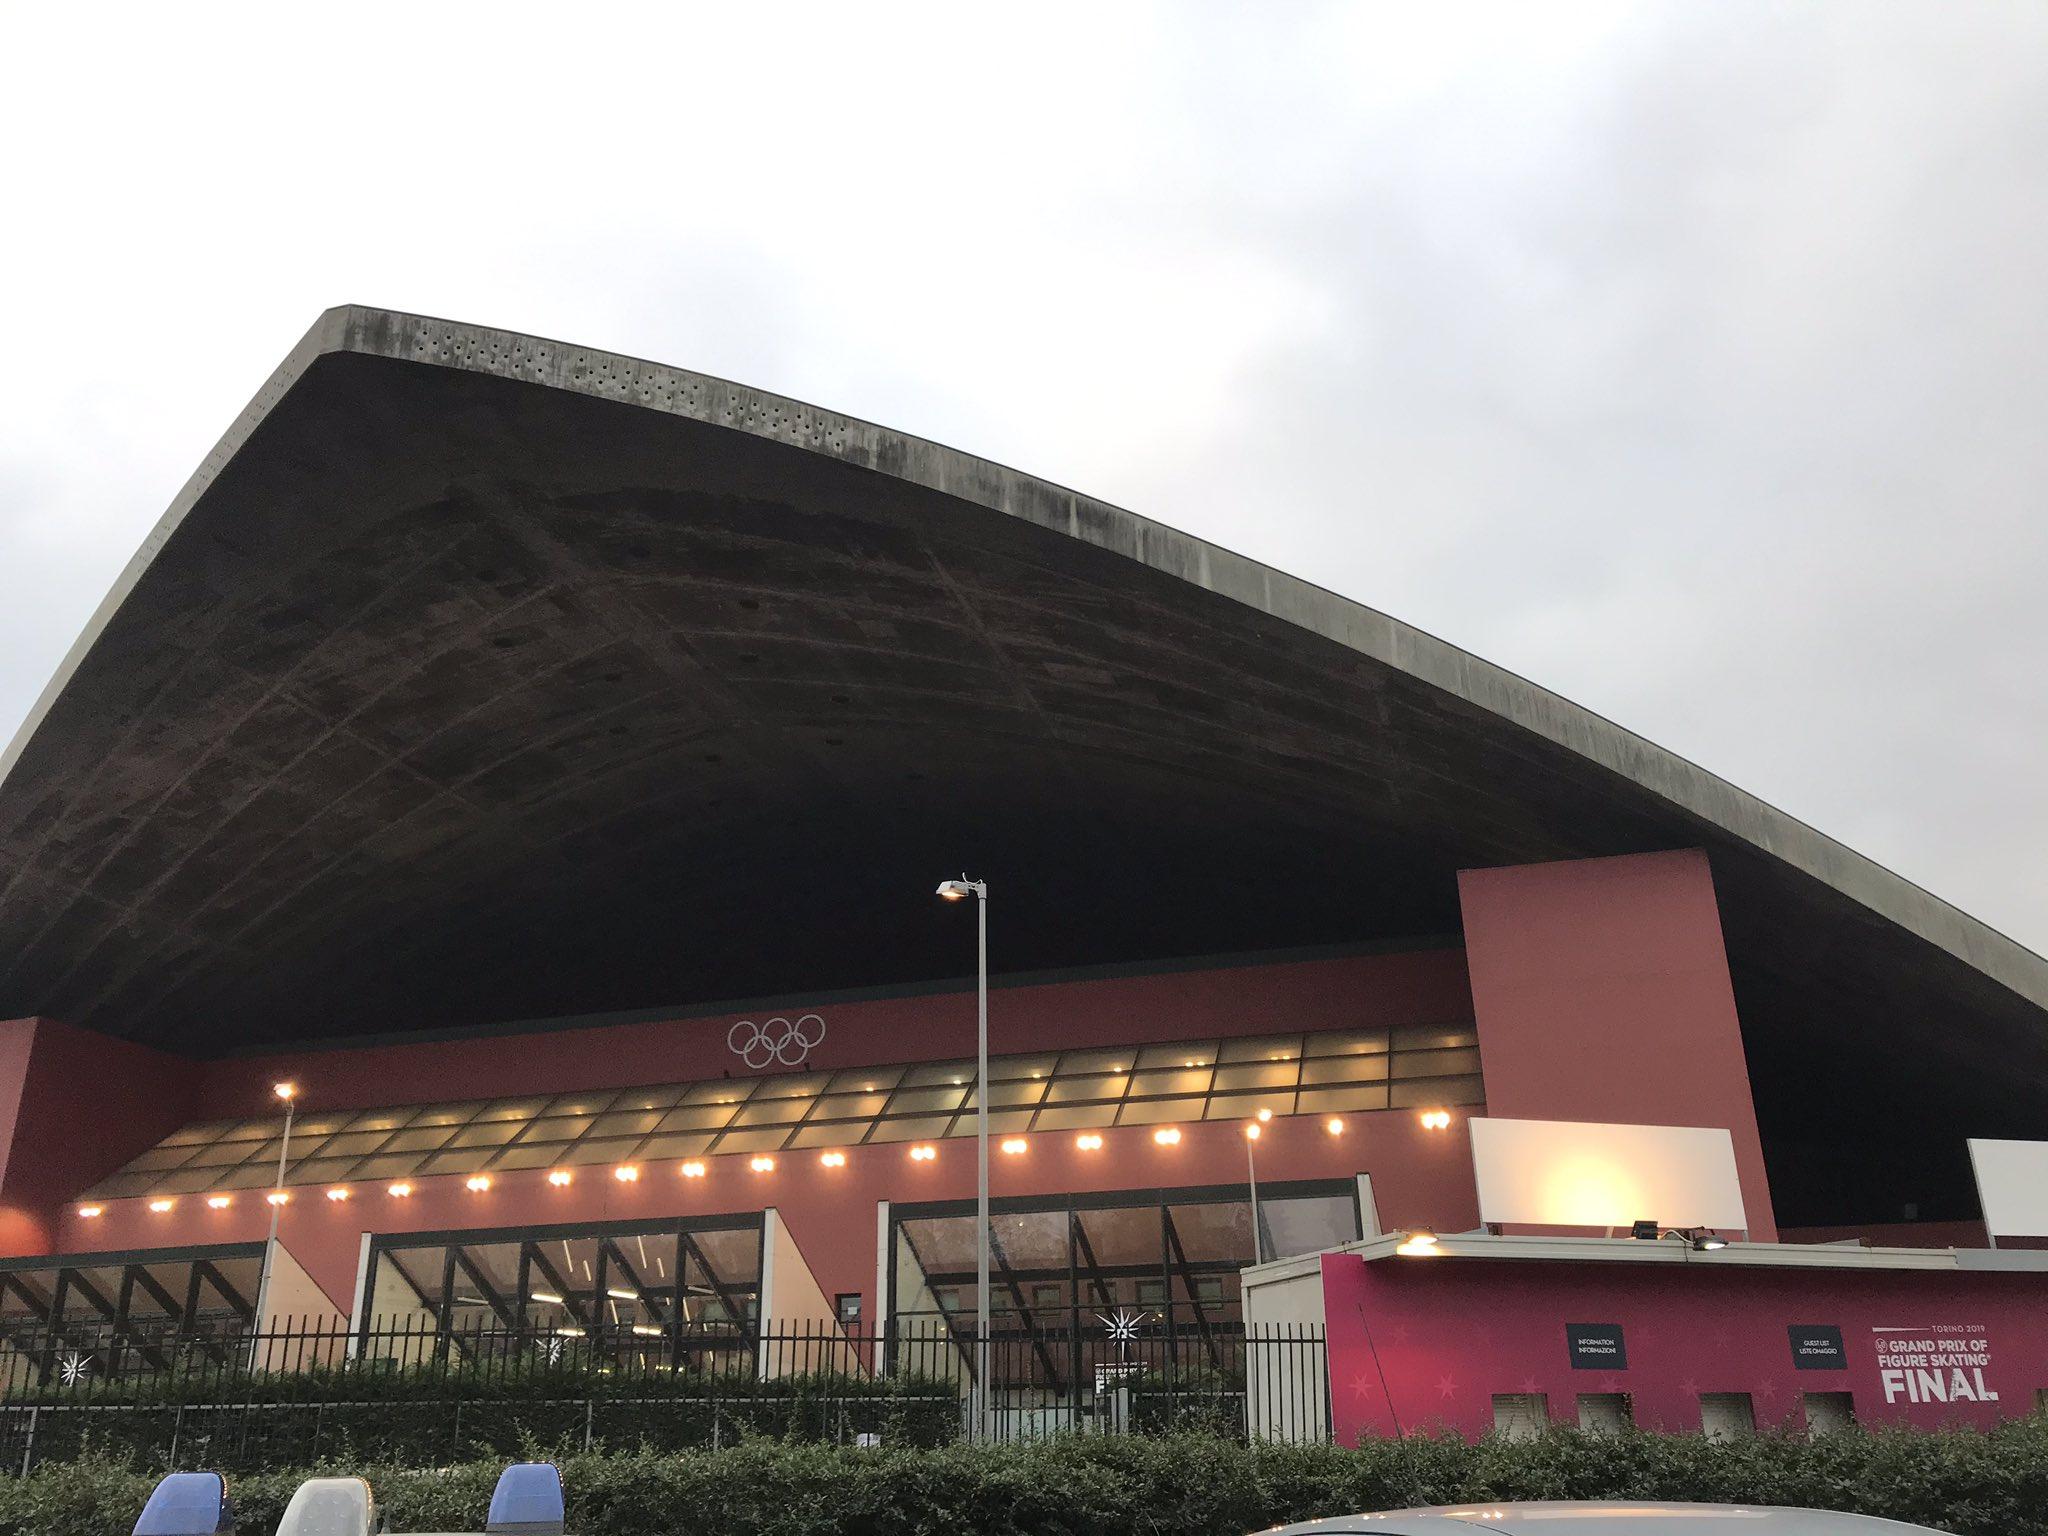 ISU Grand Prix of Figure Skating Final (Senior & Junior). Dec 05 - Dec 08, 2019.  Torino /ITA  - Страница 3 EK7QpSQUcAA7EsH?format=jpg&name=4096x4096